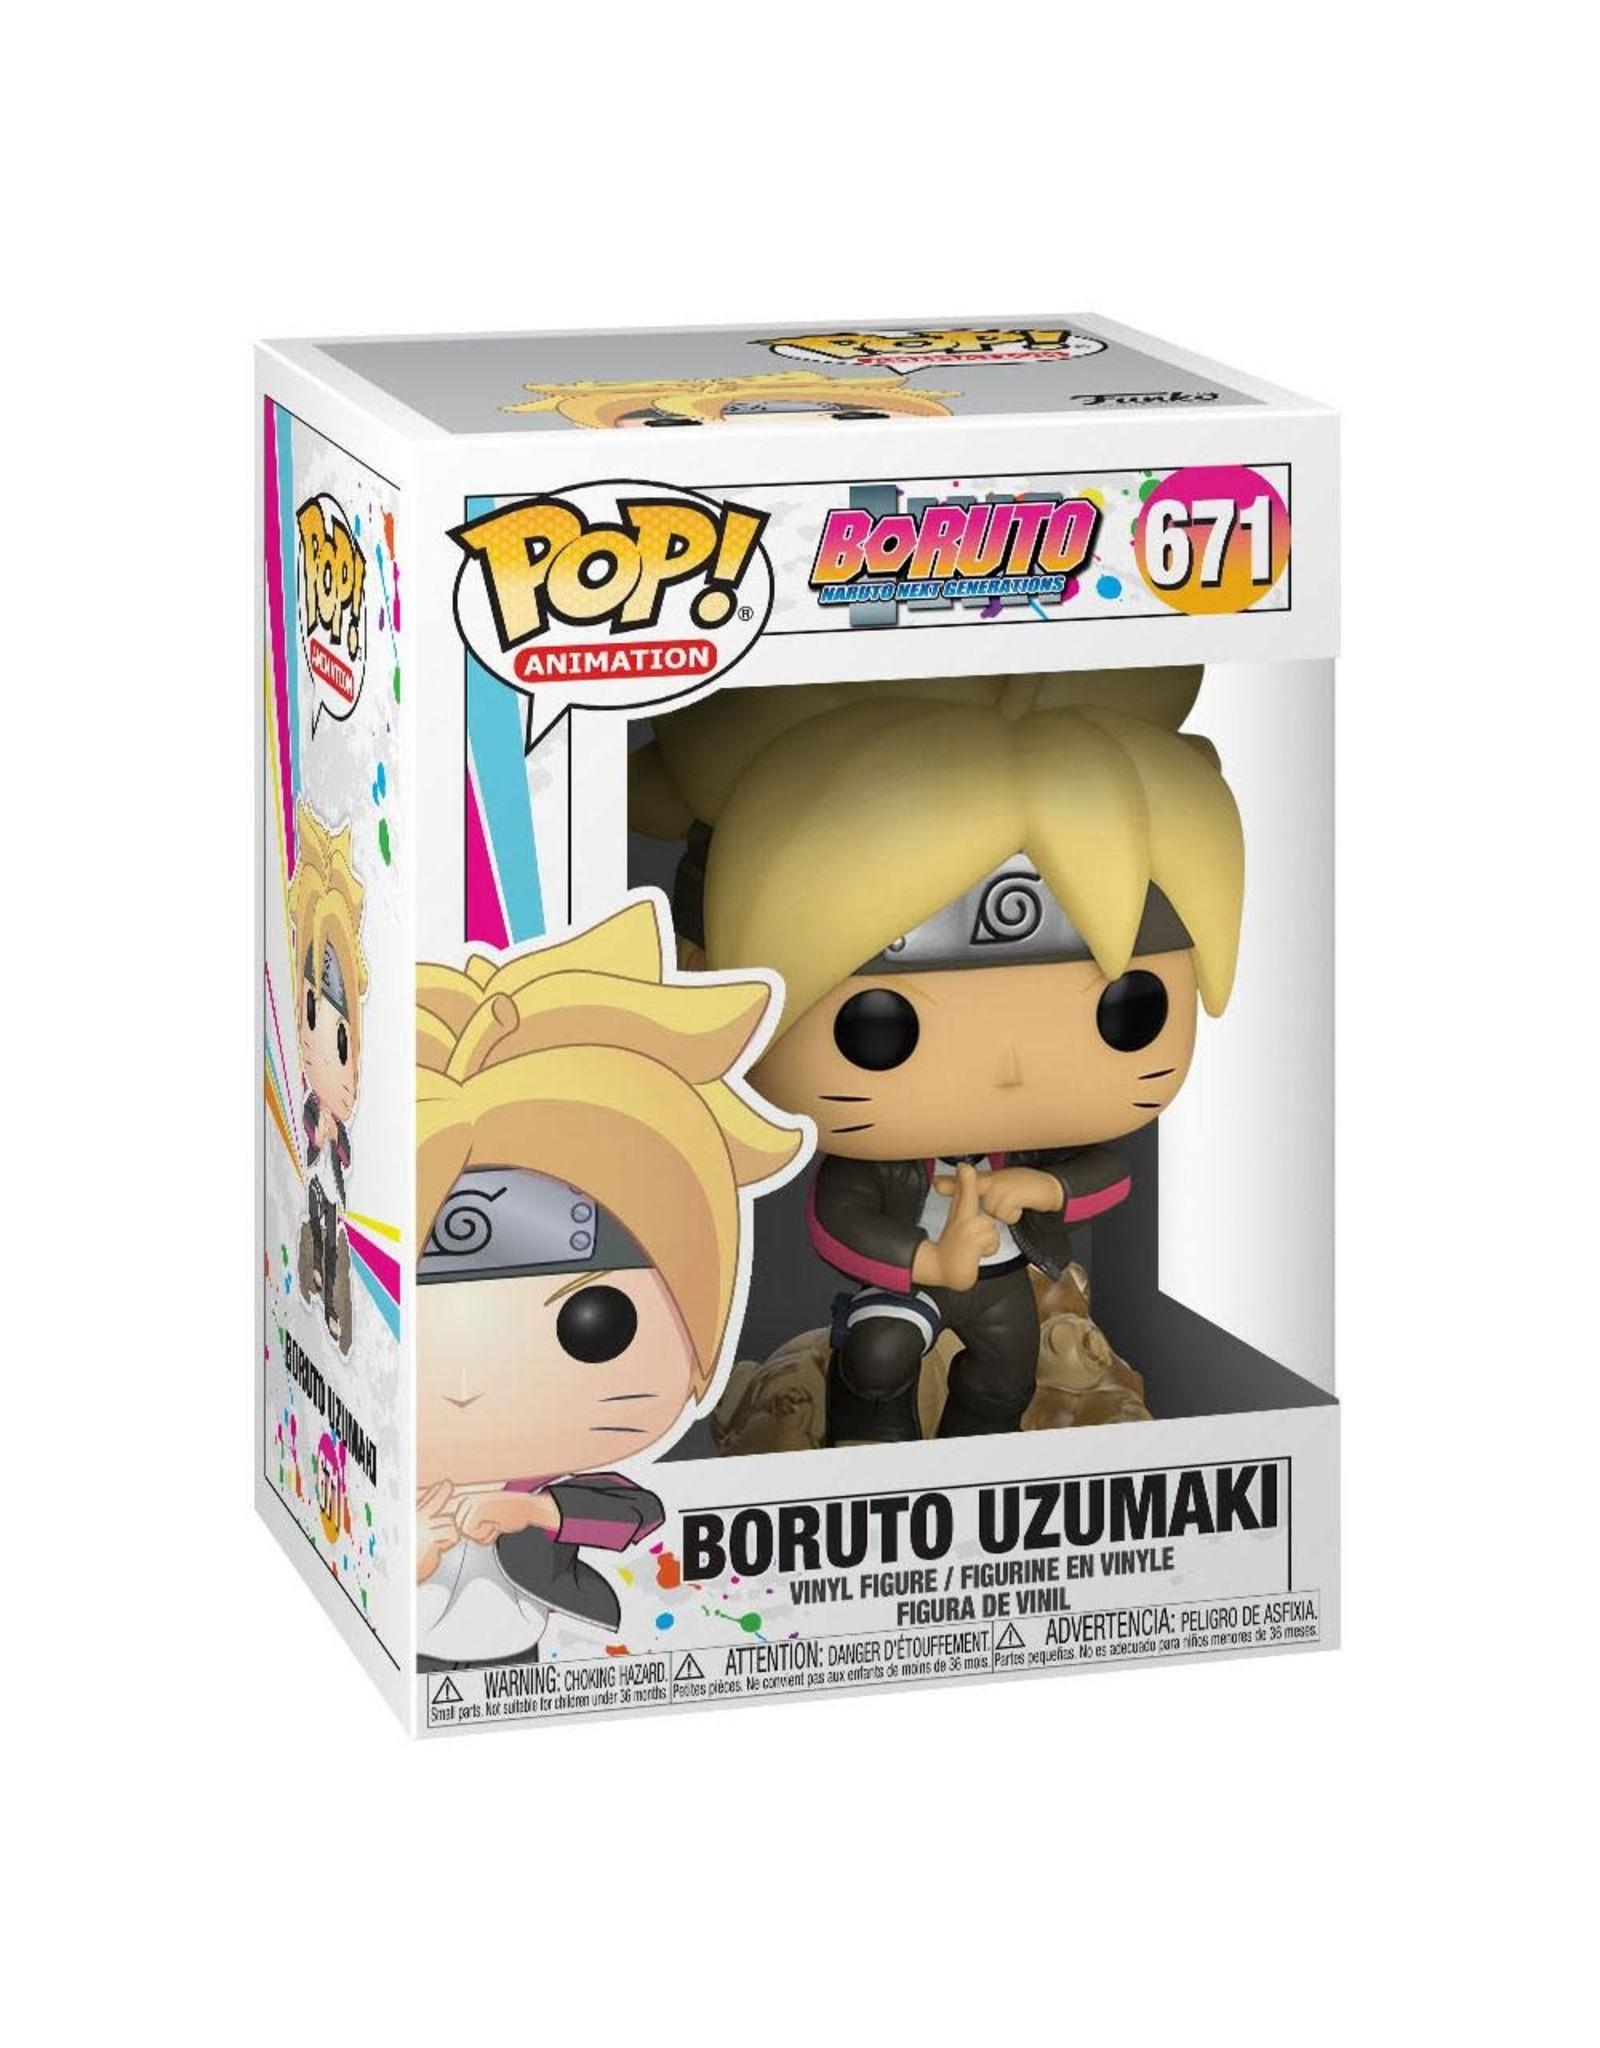 Boruto: Naruto Next Generations - Boruto Uzumaki - Funko Pop! Animation 671